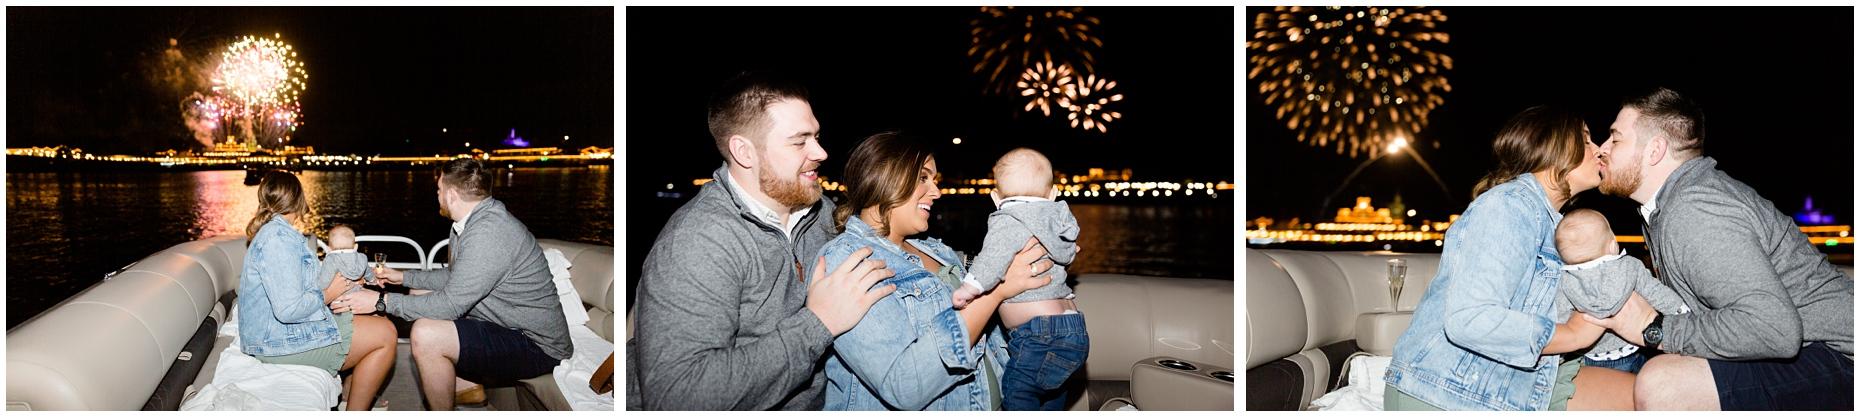 Disney_World_Fireworks_Cruise_Anniversary_Professional_Photography